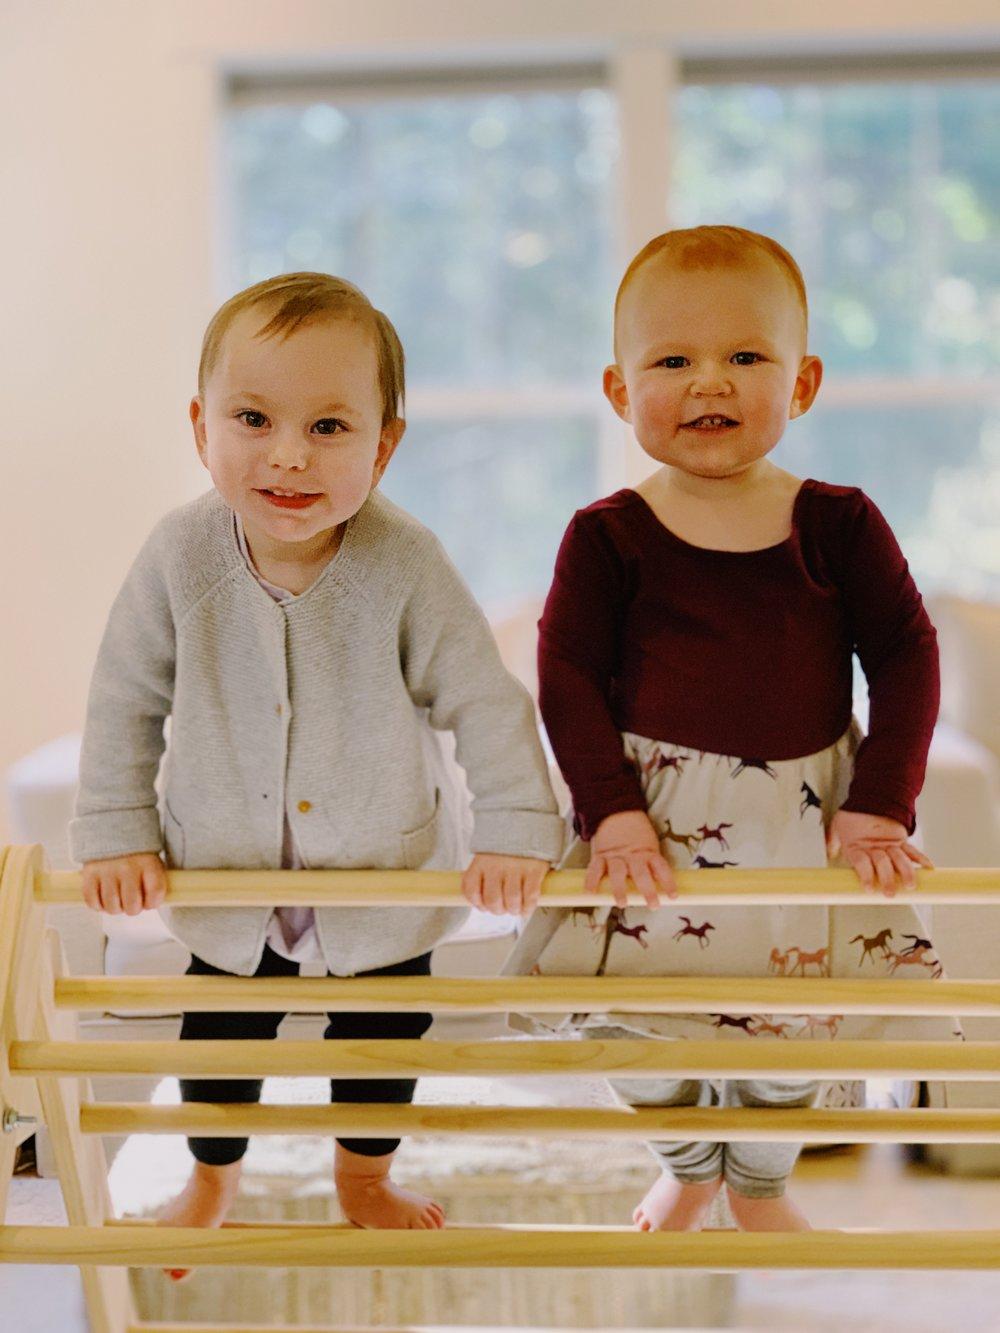 Thank you for choosingThe Montessori Guide! - Love,Dakota, Marley, Theresa & Bridget